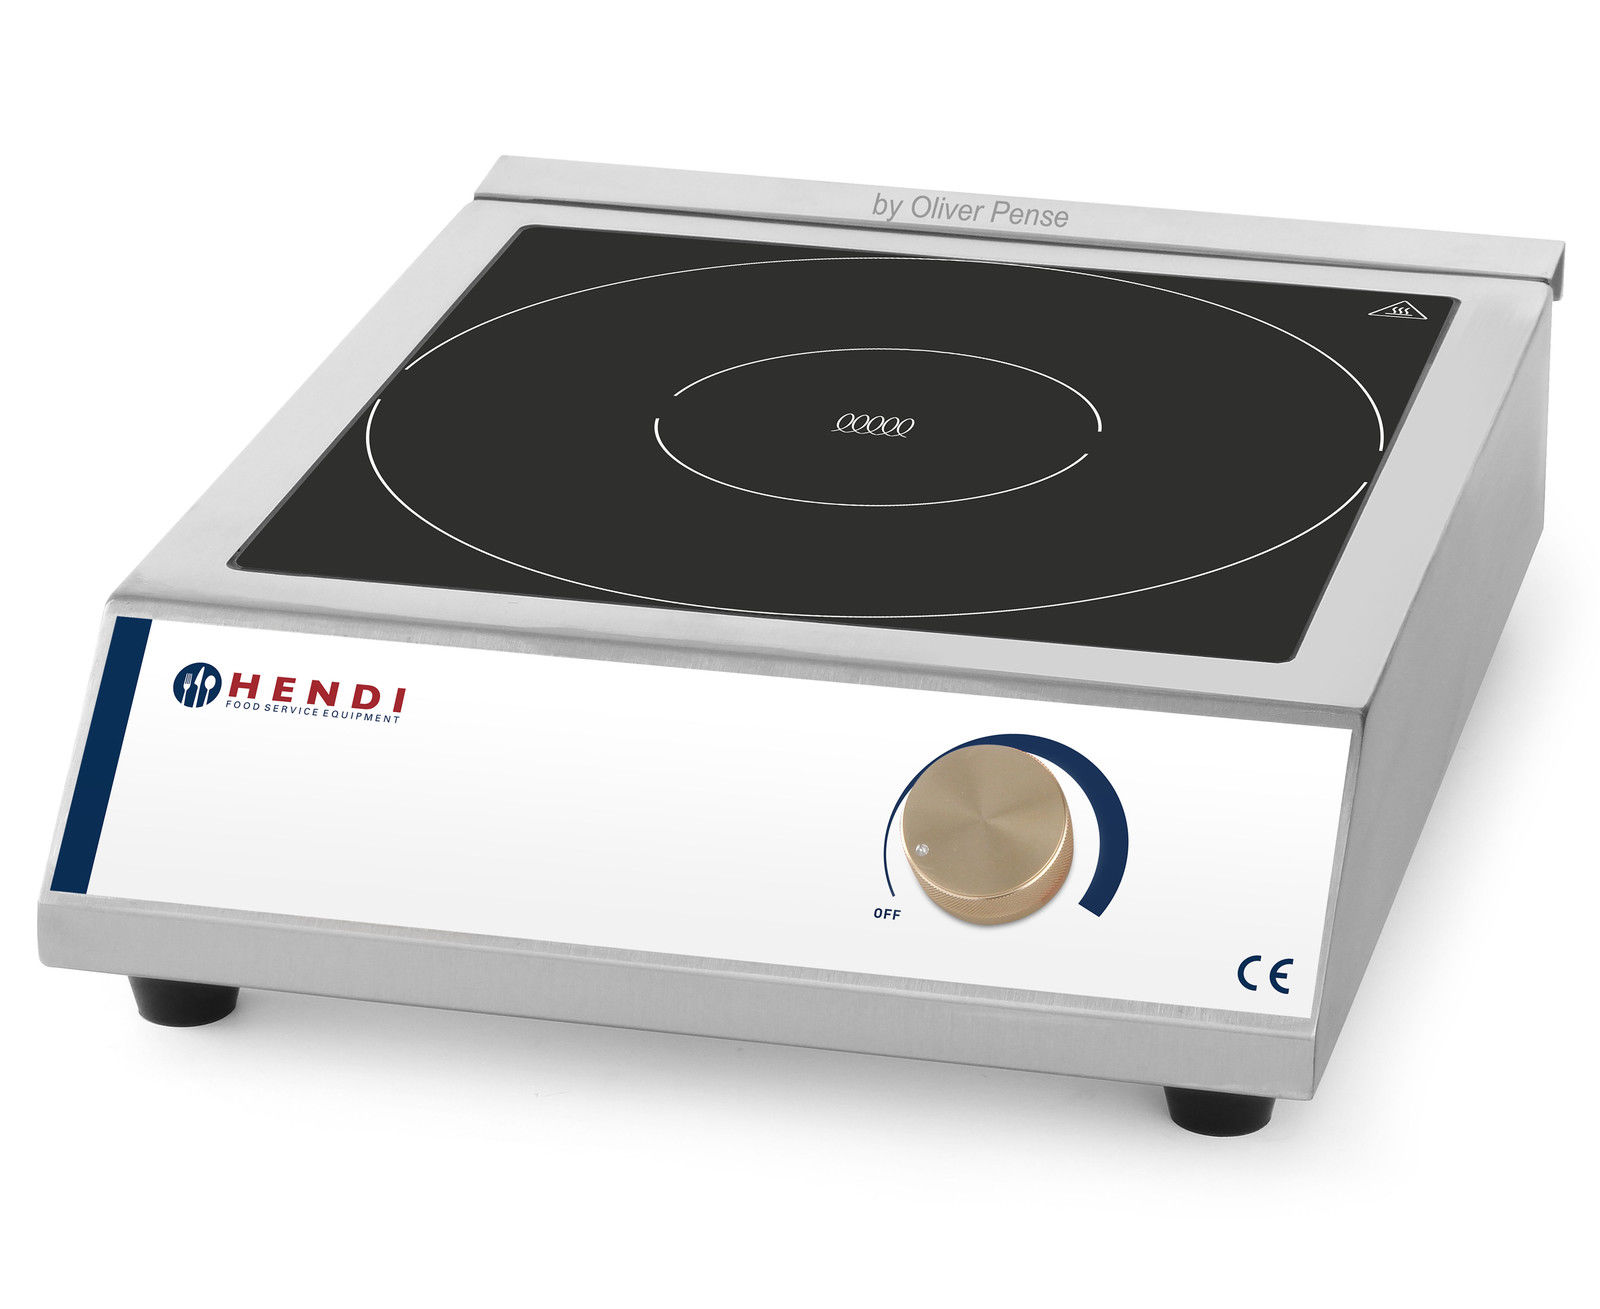 Hendi gastro induktion induktionsplatte koch platte kocher for Kochfeld induktion 2 platten